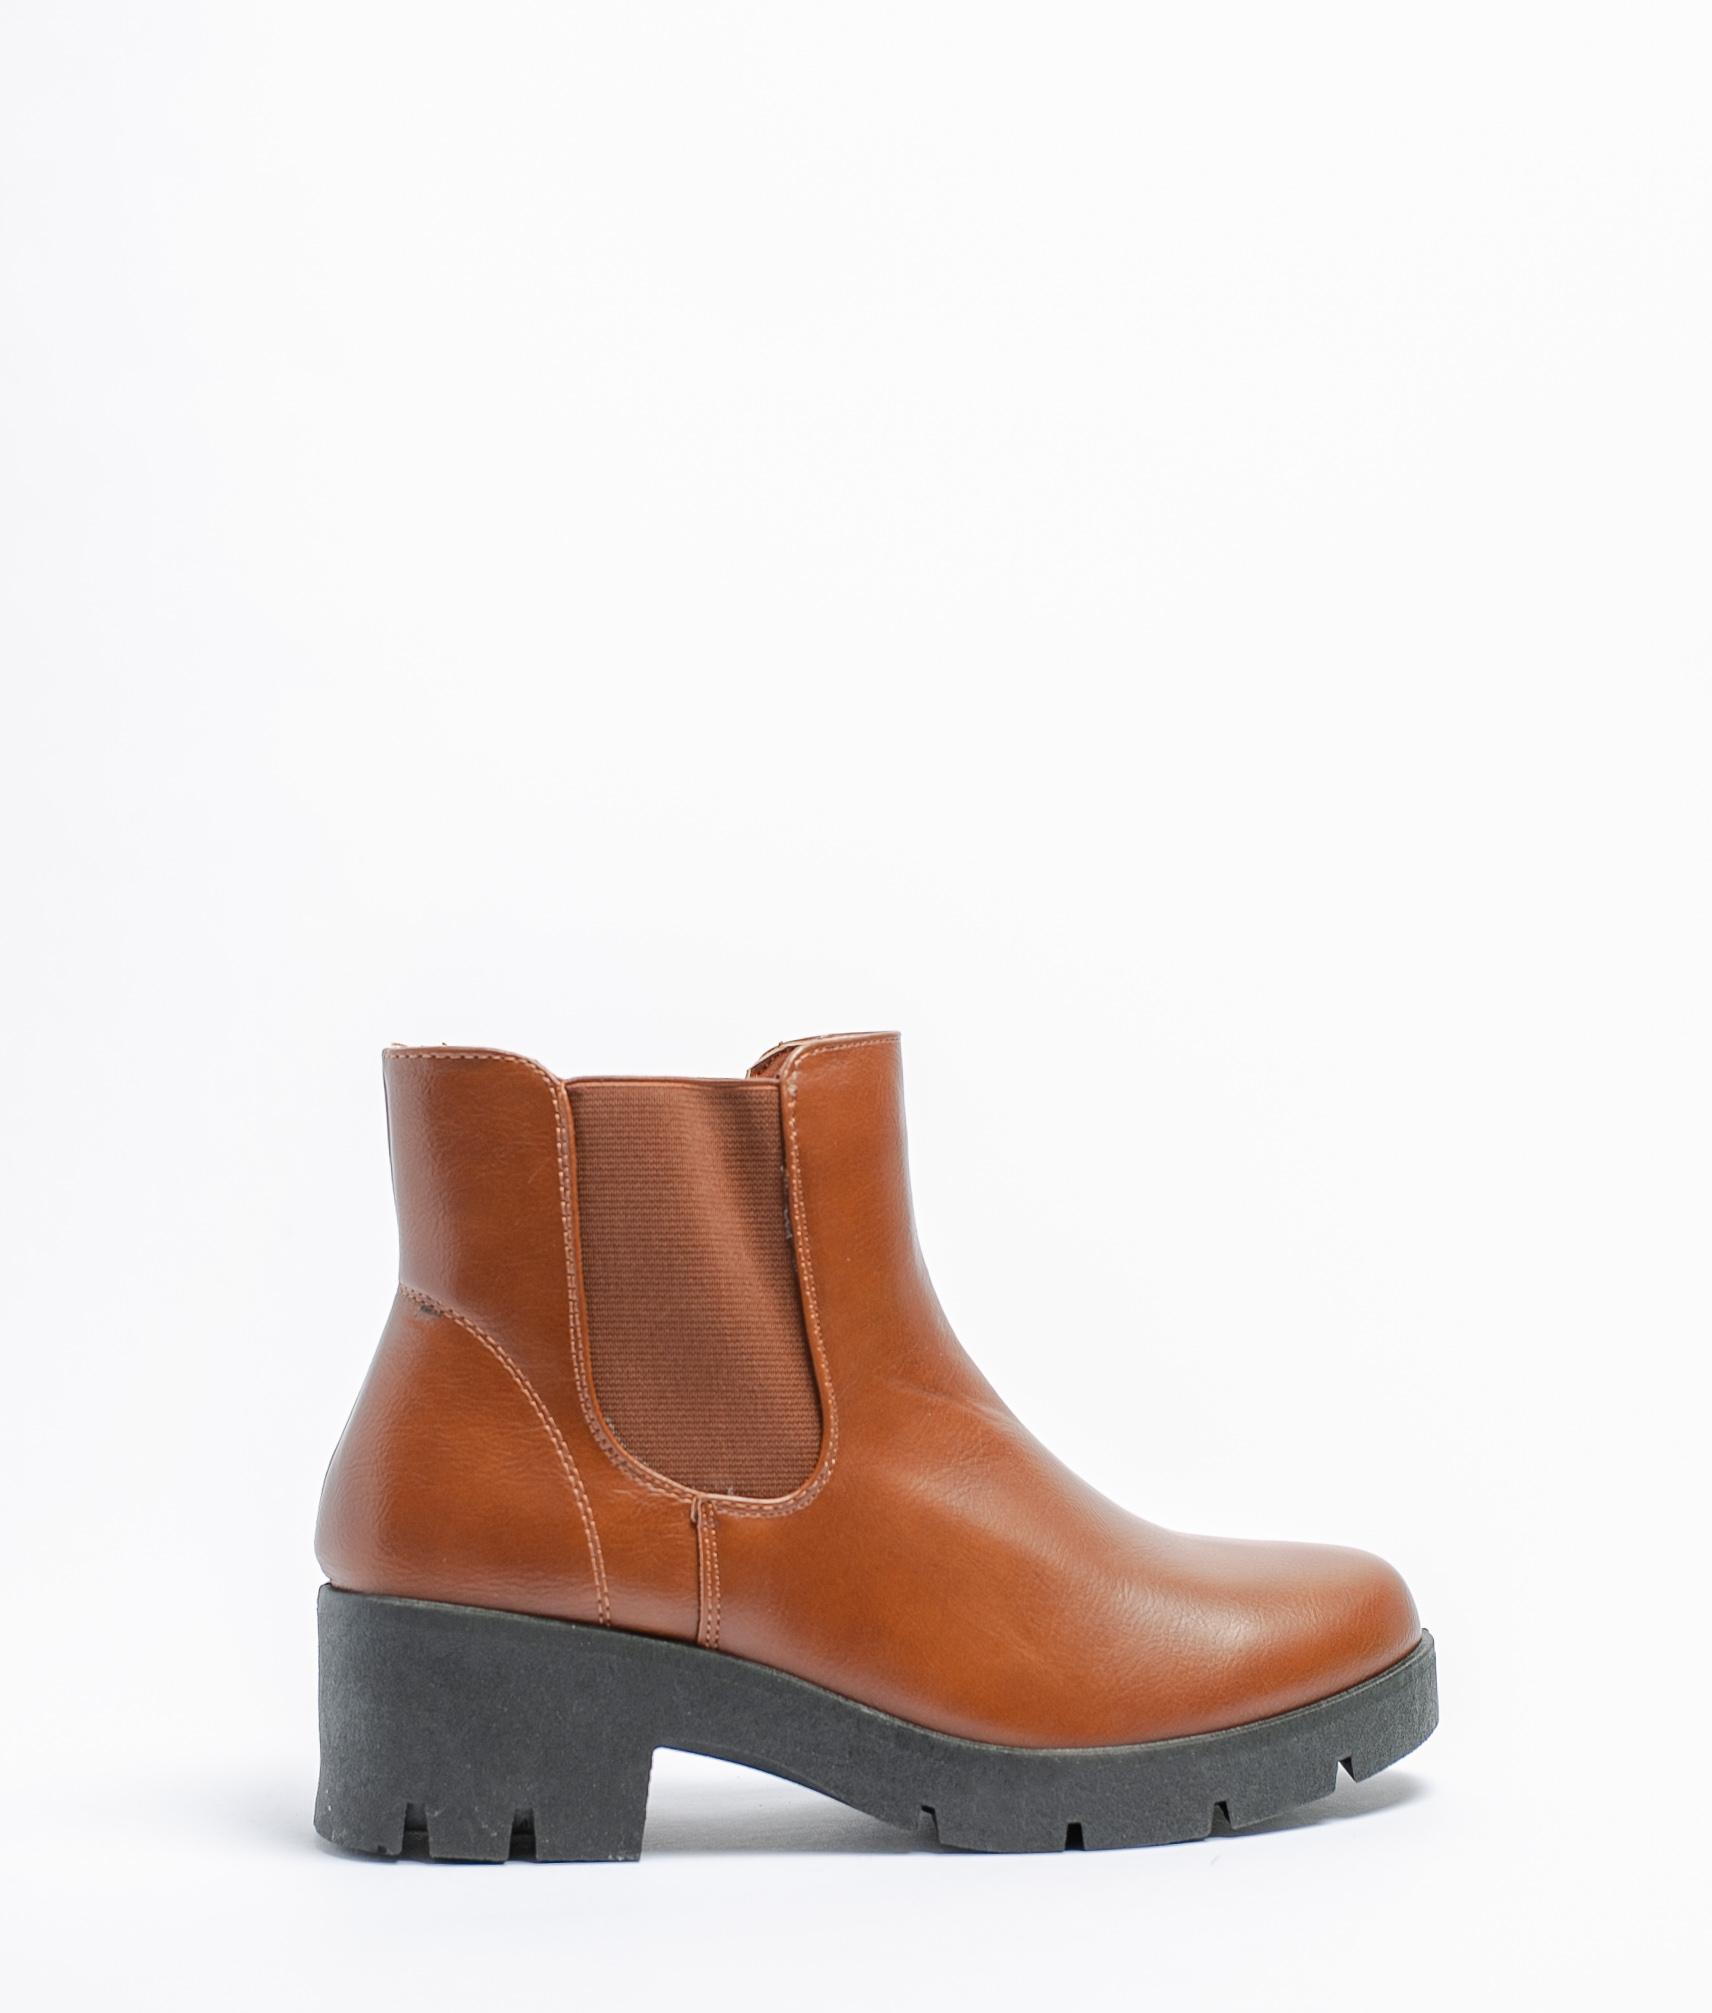 Boot Petite Turina - Chameau